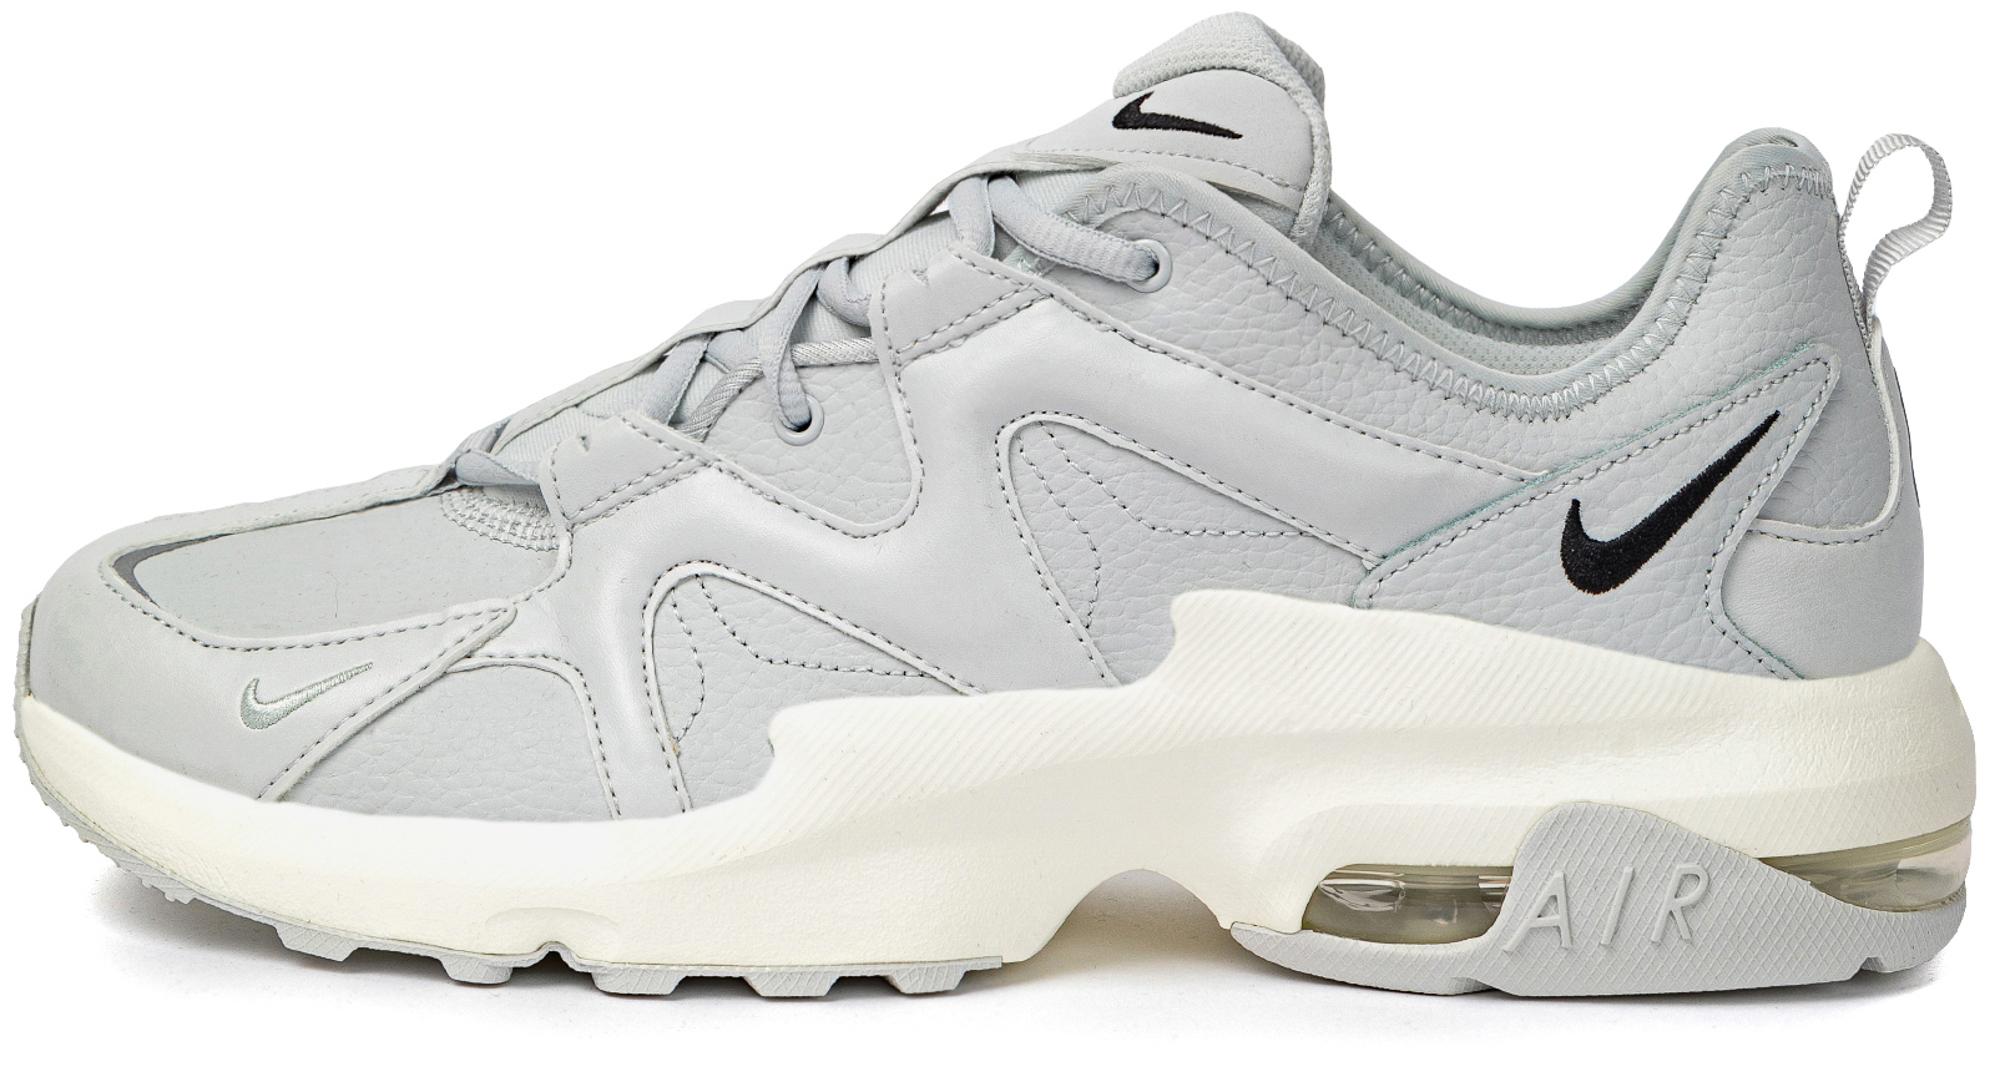 Nike Кроссовки мужские Nike Air Max Graviton Lea, размер 43.5